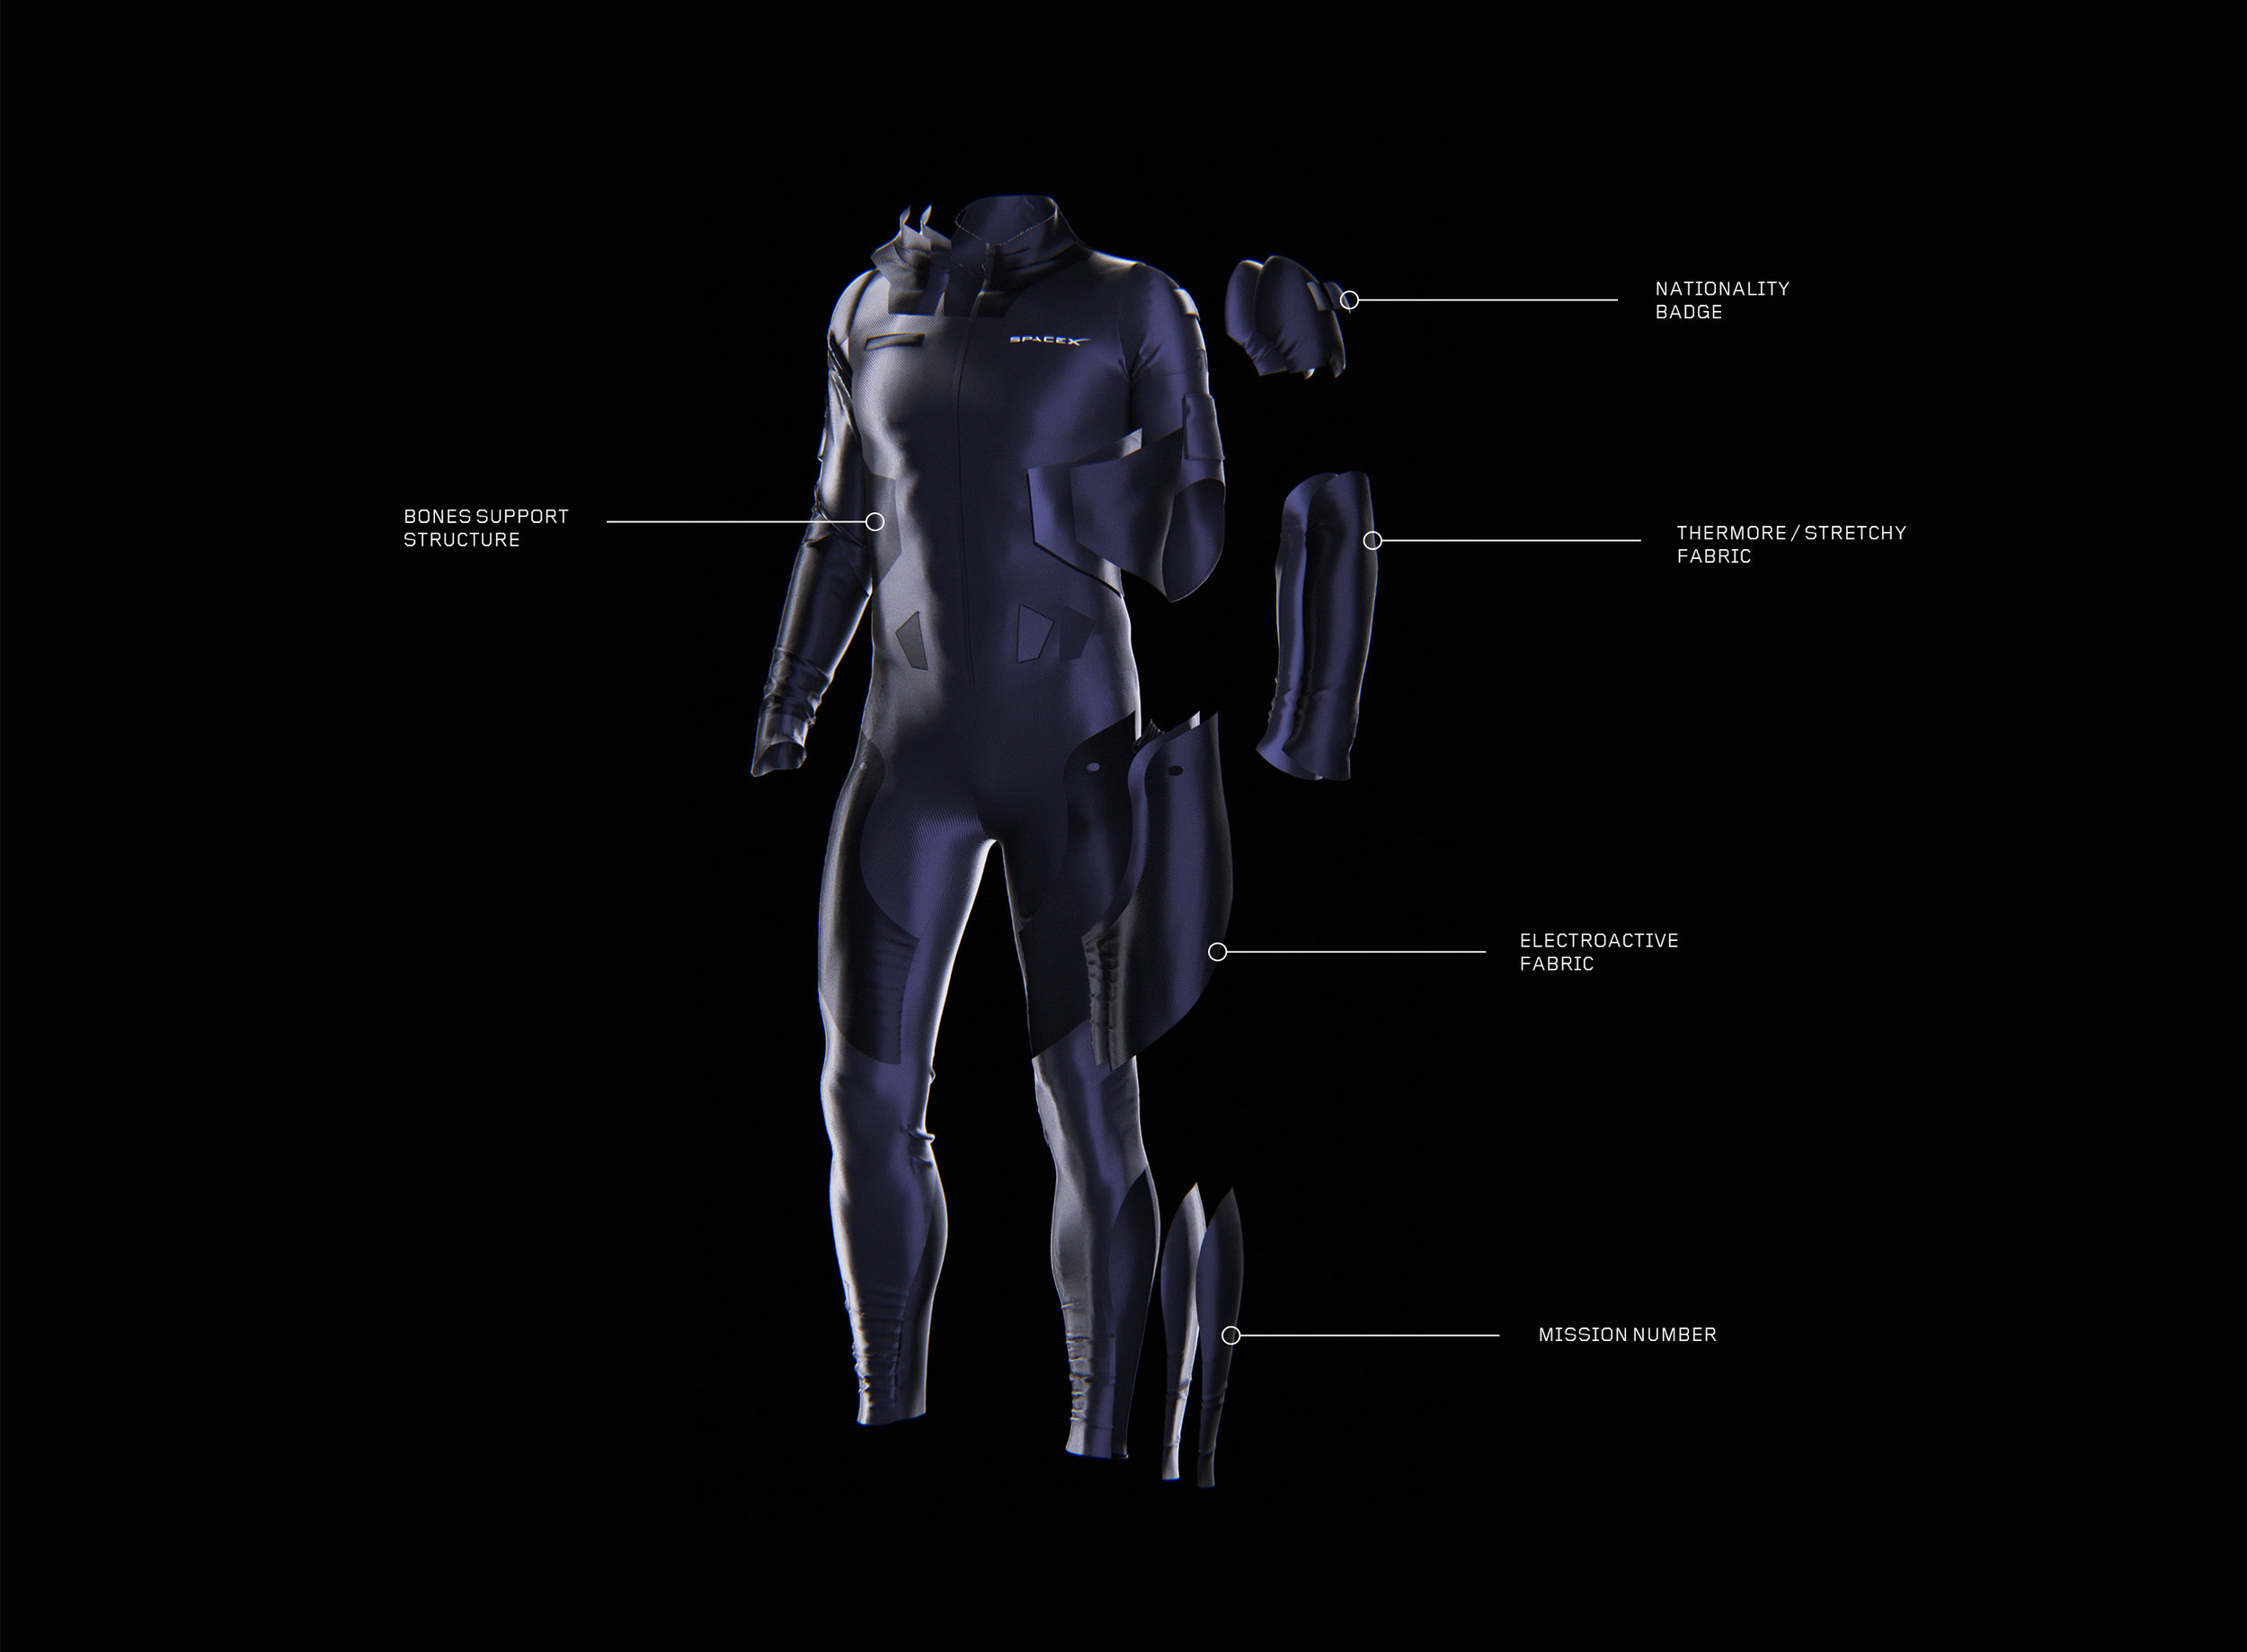 SpaceX suit construction